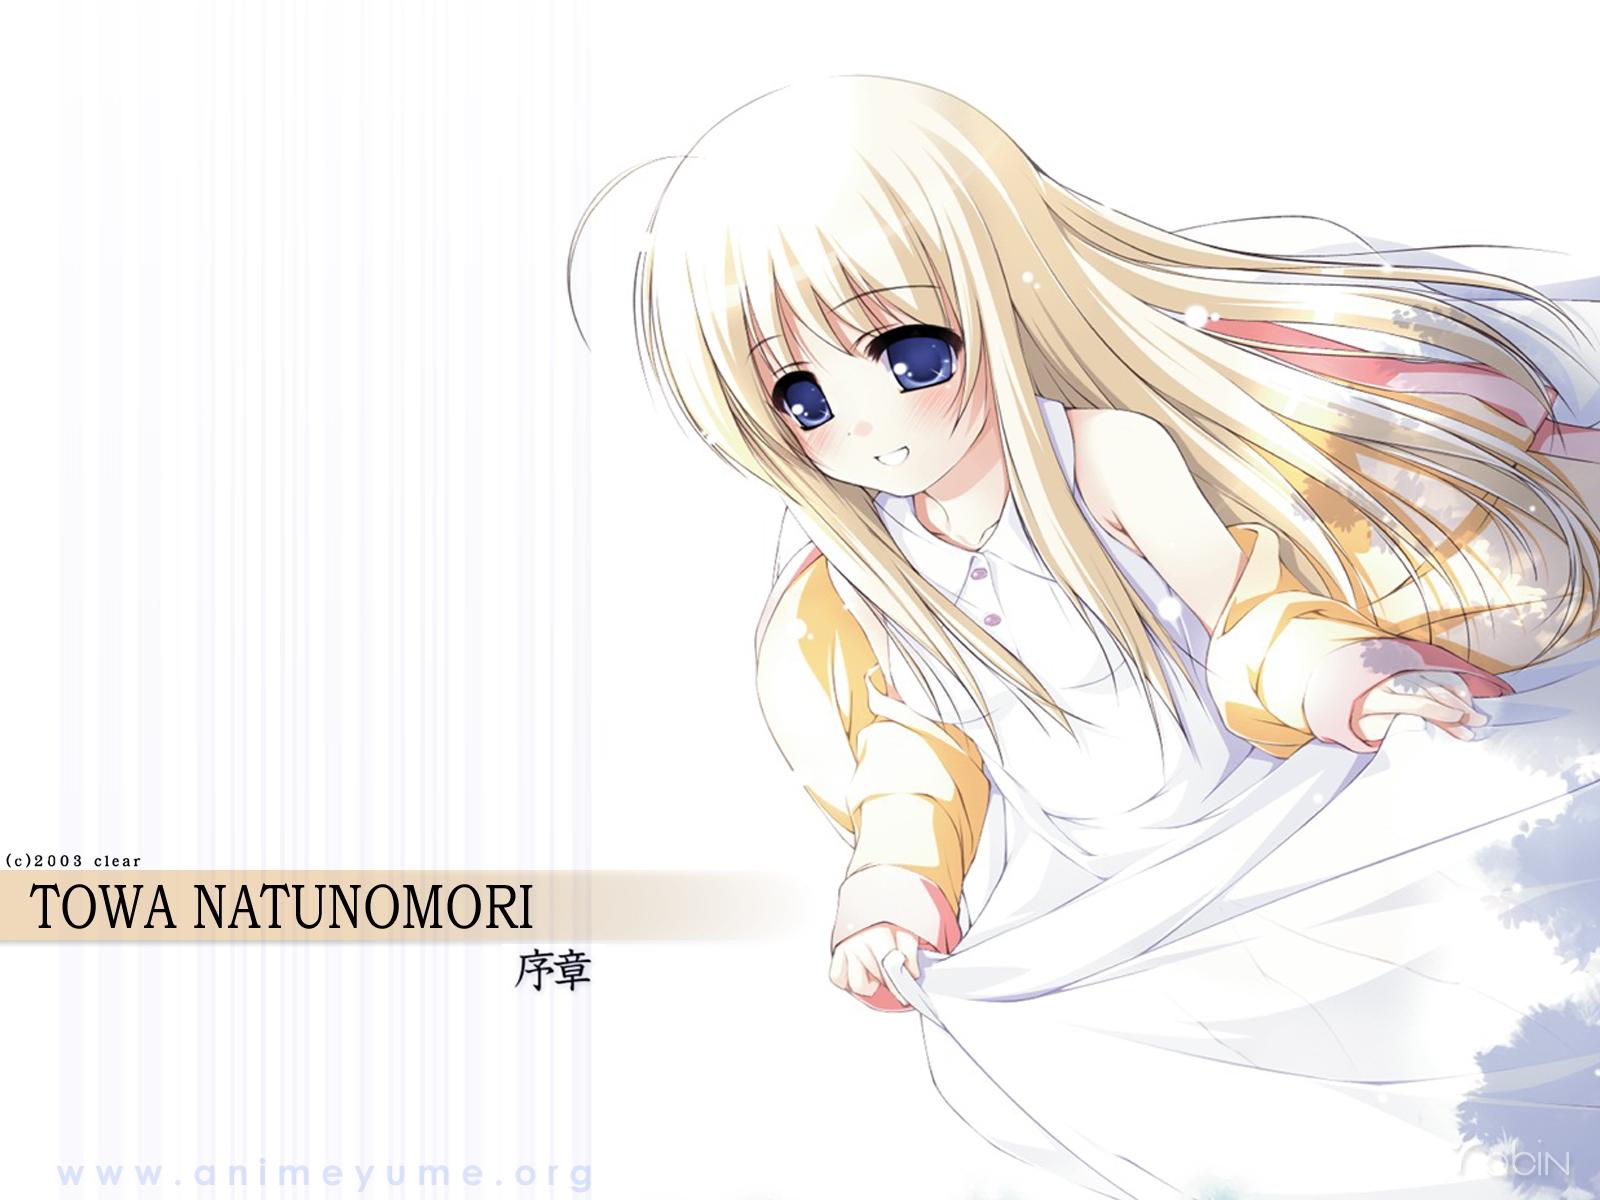 blonde_hair blue_eyes blush long_hair natunomori_towa ooji te_no_hira_wo_taiyou_ni watermark